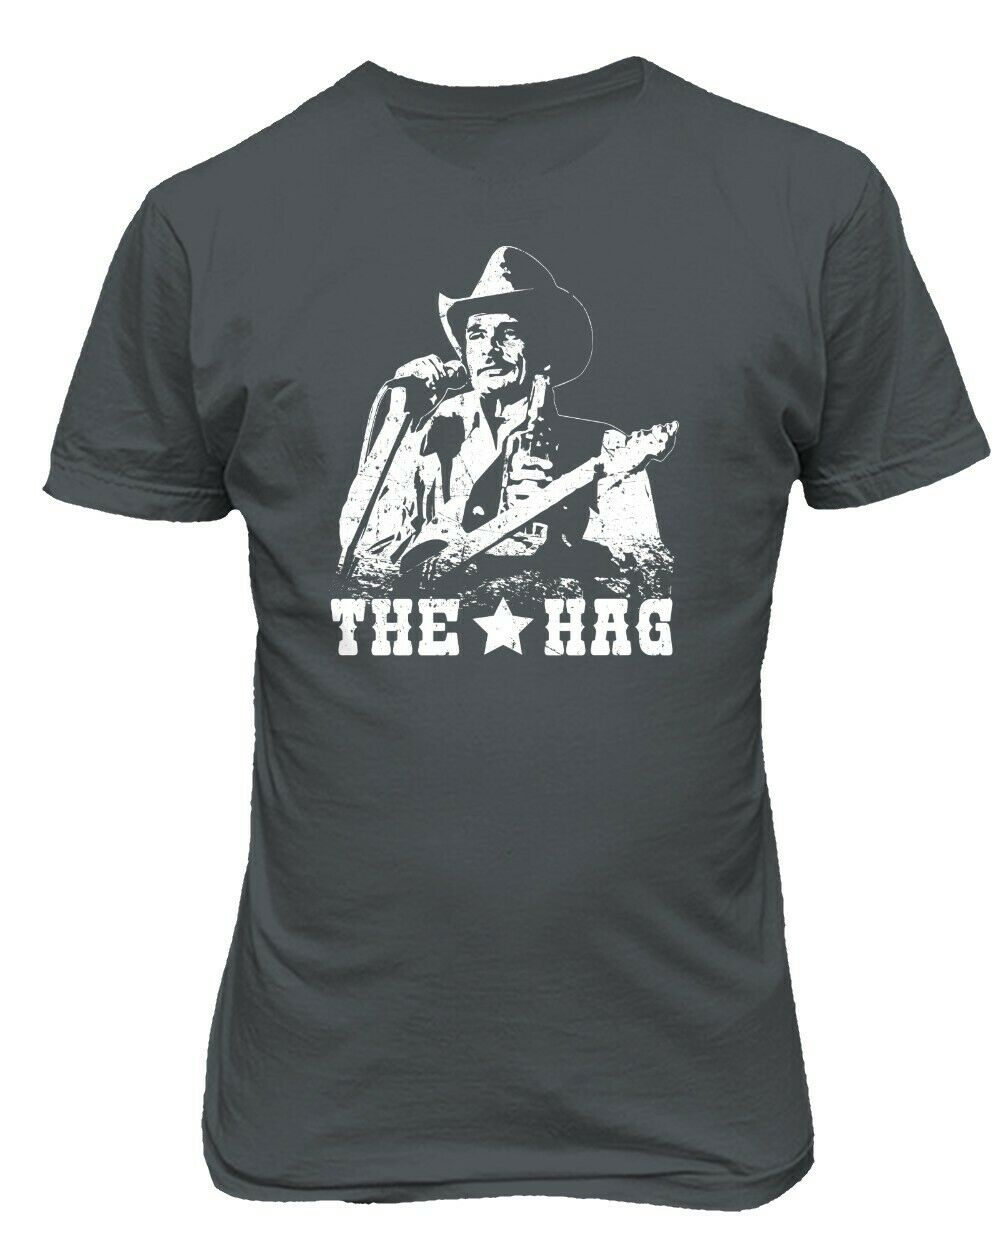 Merle Haggard Vintage Land Musik Outlaw Redneck Konzert Band Männer T-Shirt